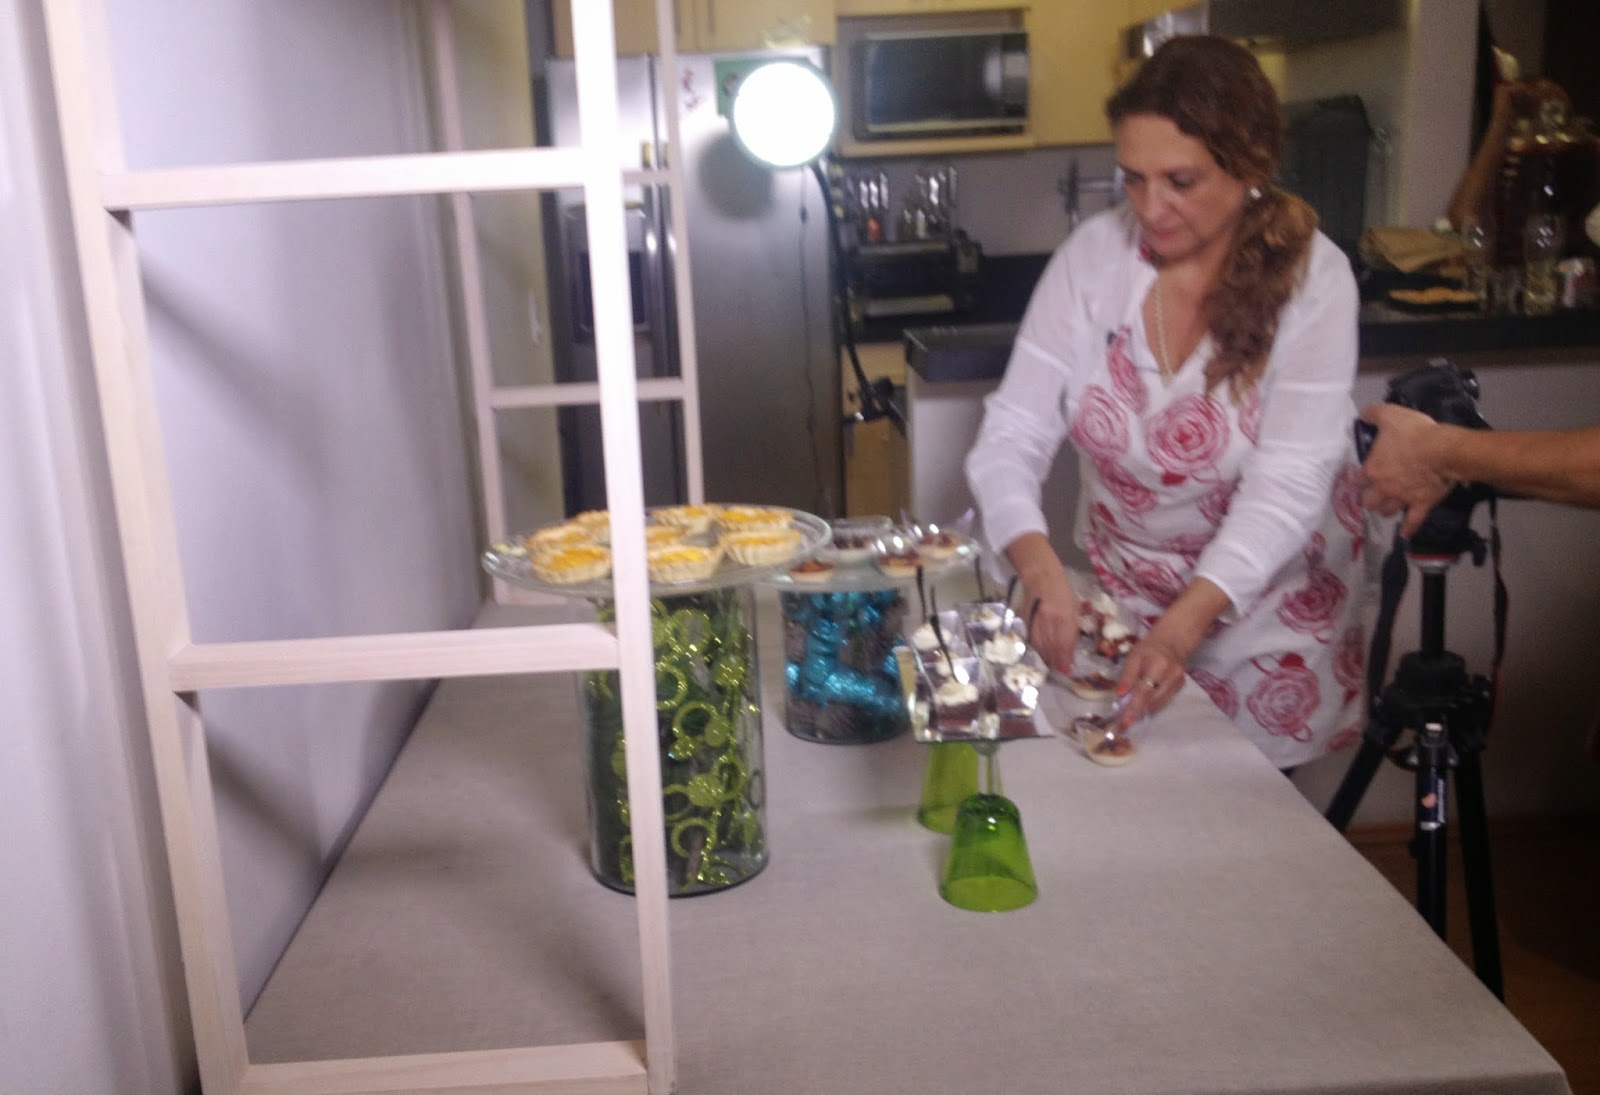 La casa de alejandra mesa de dulces de navidad diy - Como poner bloques de vidrio ...